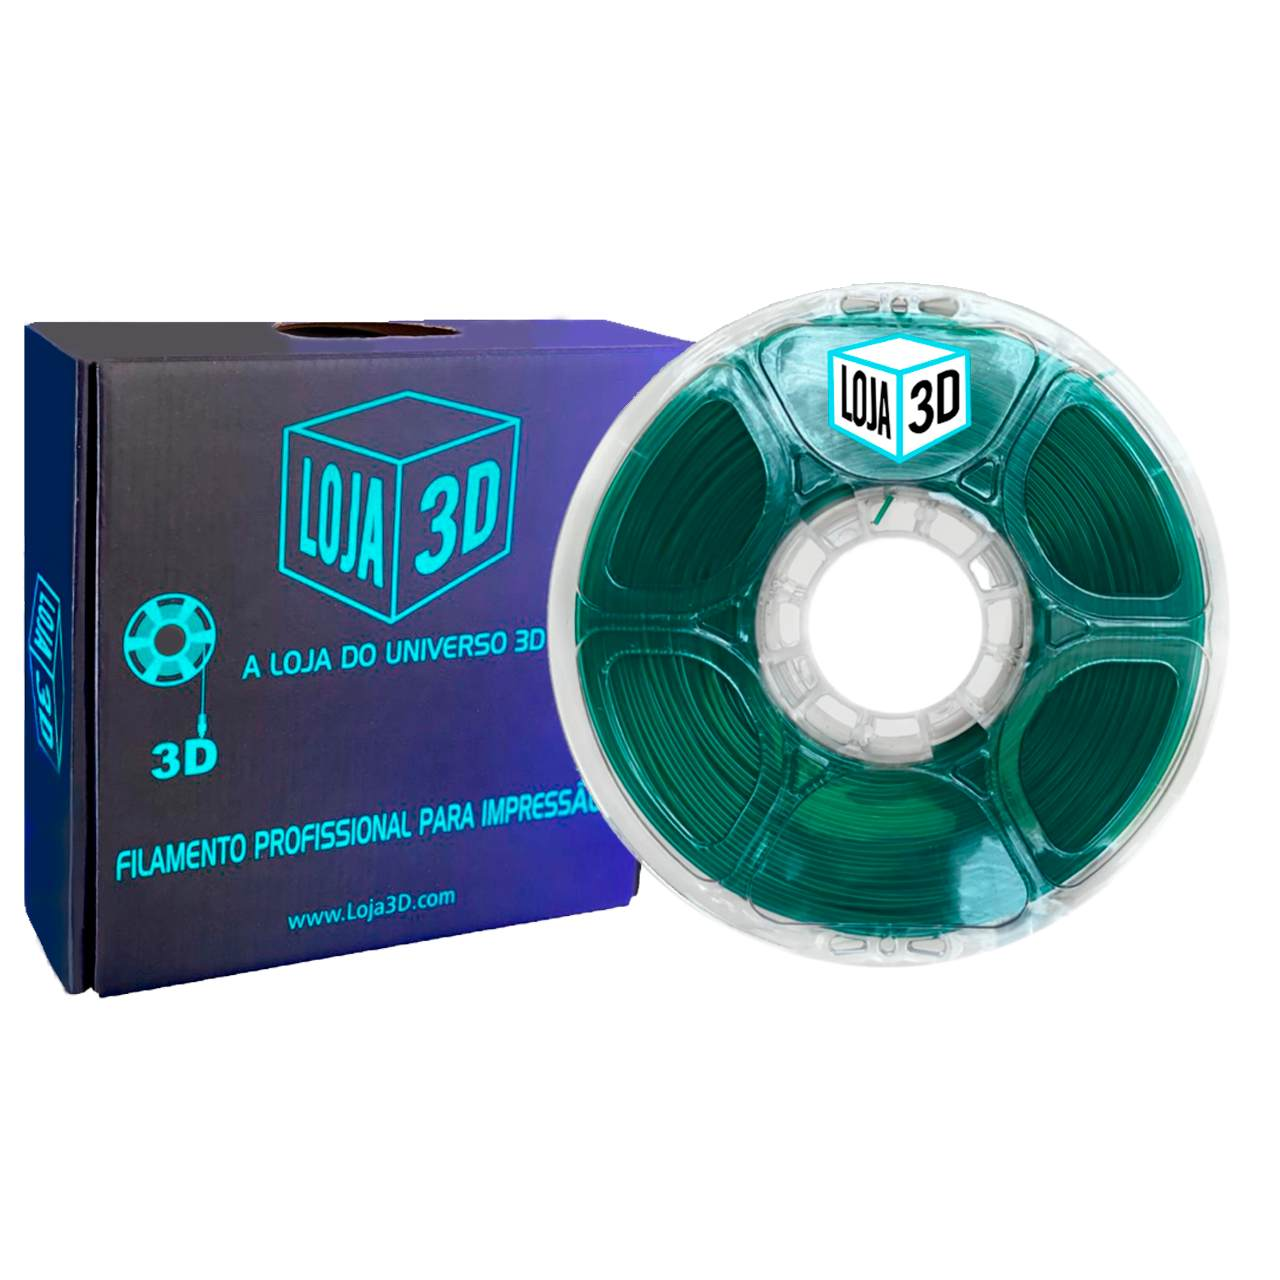 Filamento PET-G Pro - Verde - Loja 3D - 1.75mm - 1kg